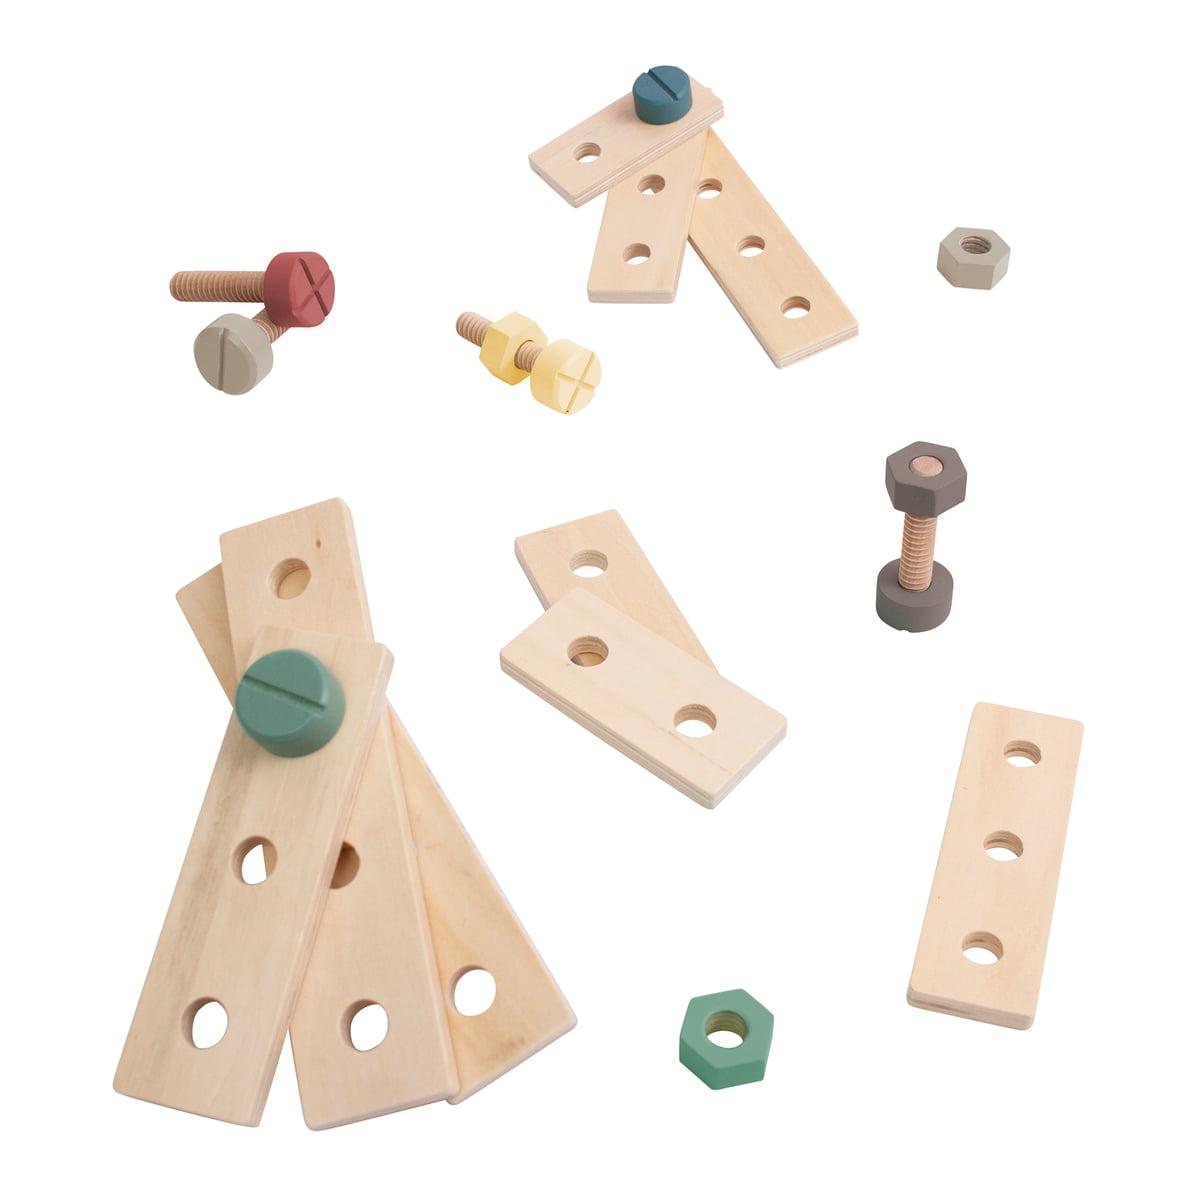 Sebra-Bau-Spielset-aus-Holz-warmes-grau-Freisteller